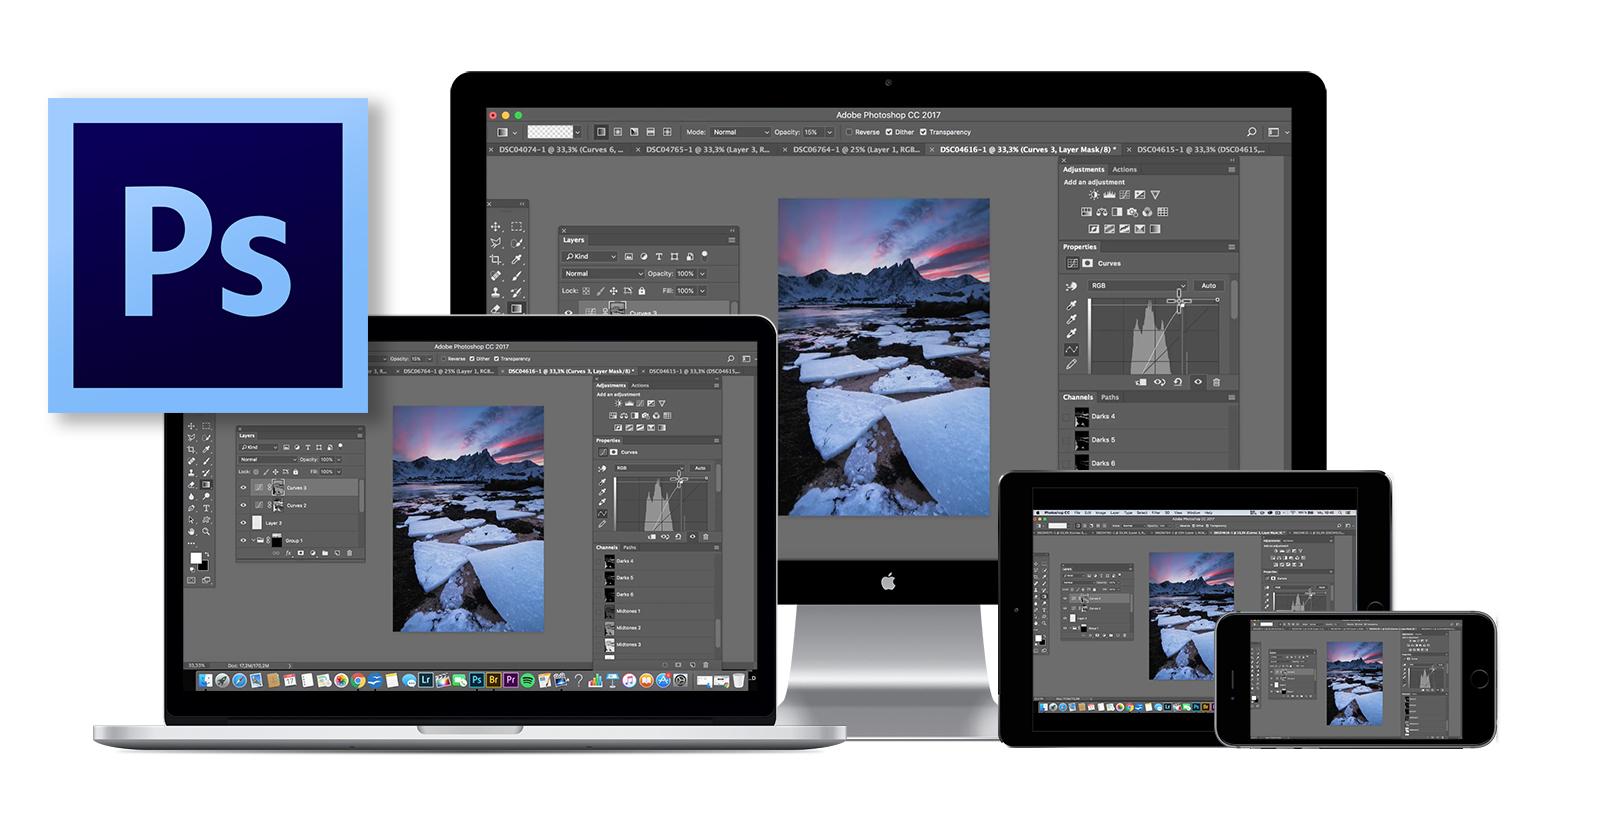 Benjamin Jaworskyj Videokurs Landschaftsfotos mit Photoshop bearbeiten lernen